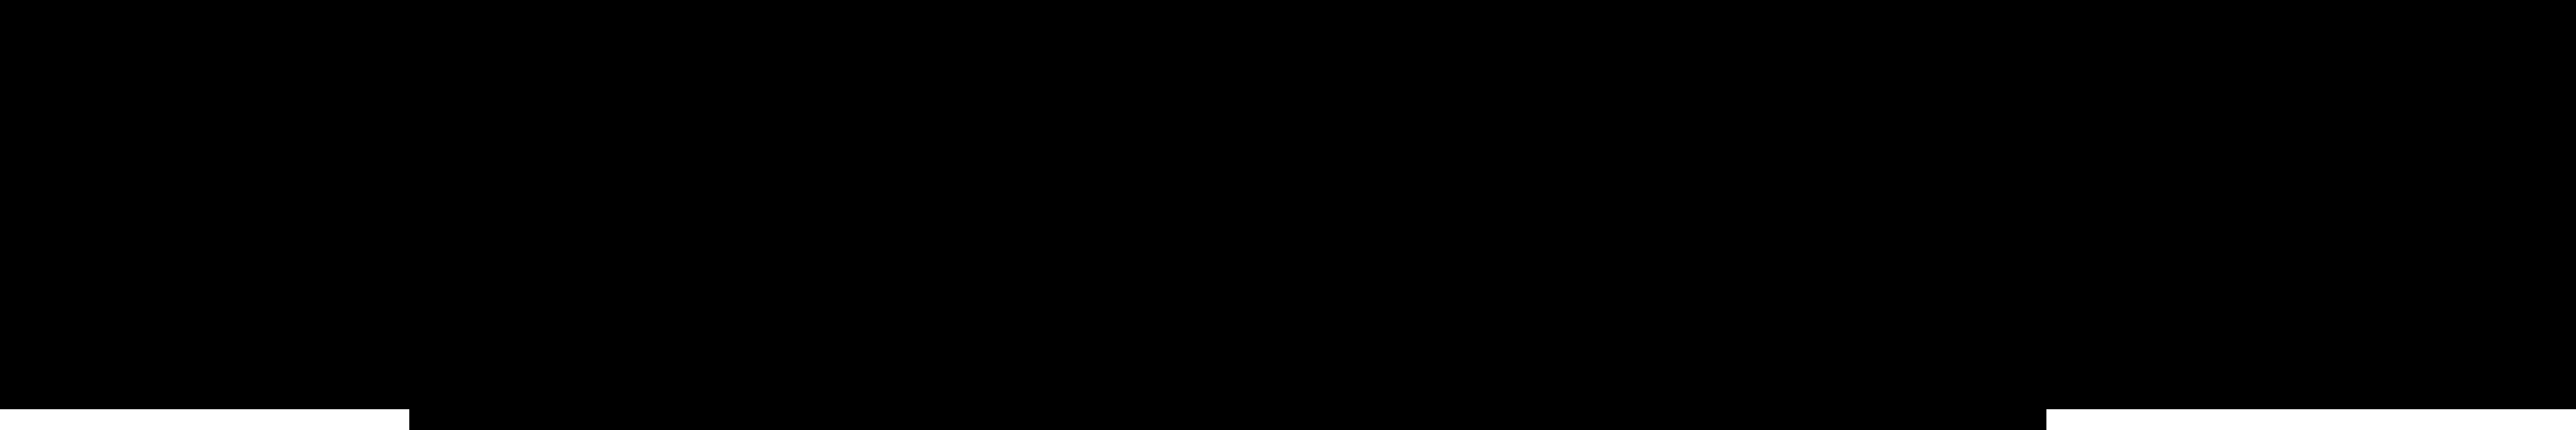 logo-flat-black